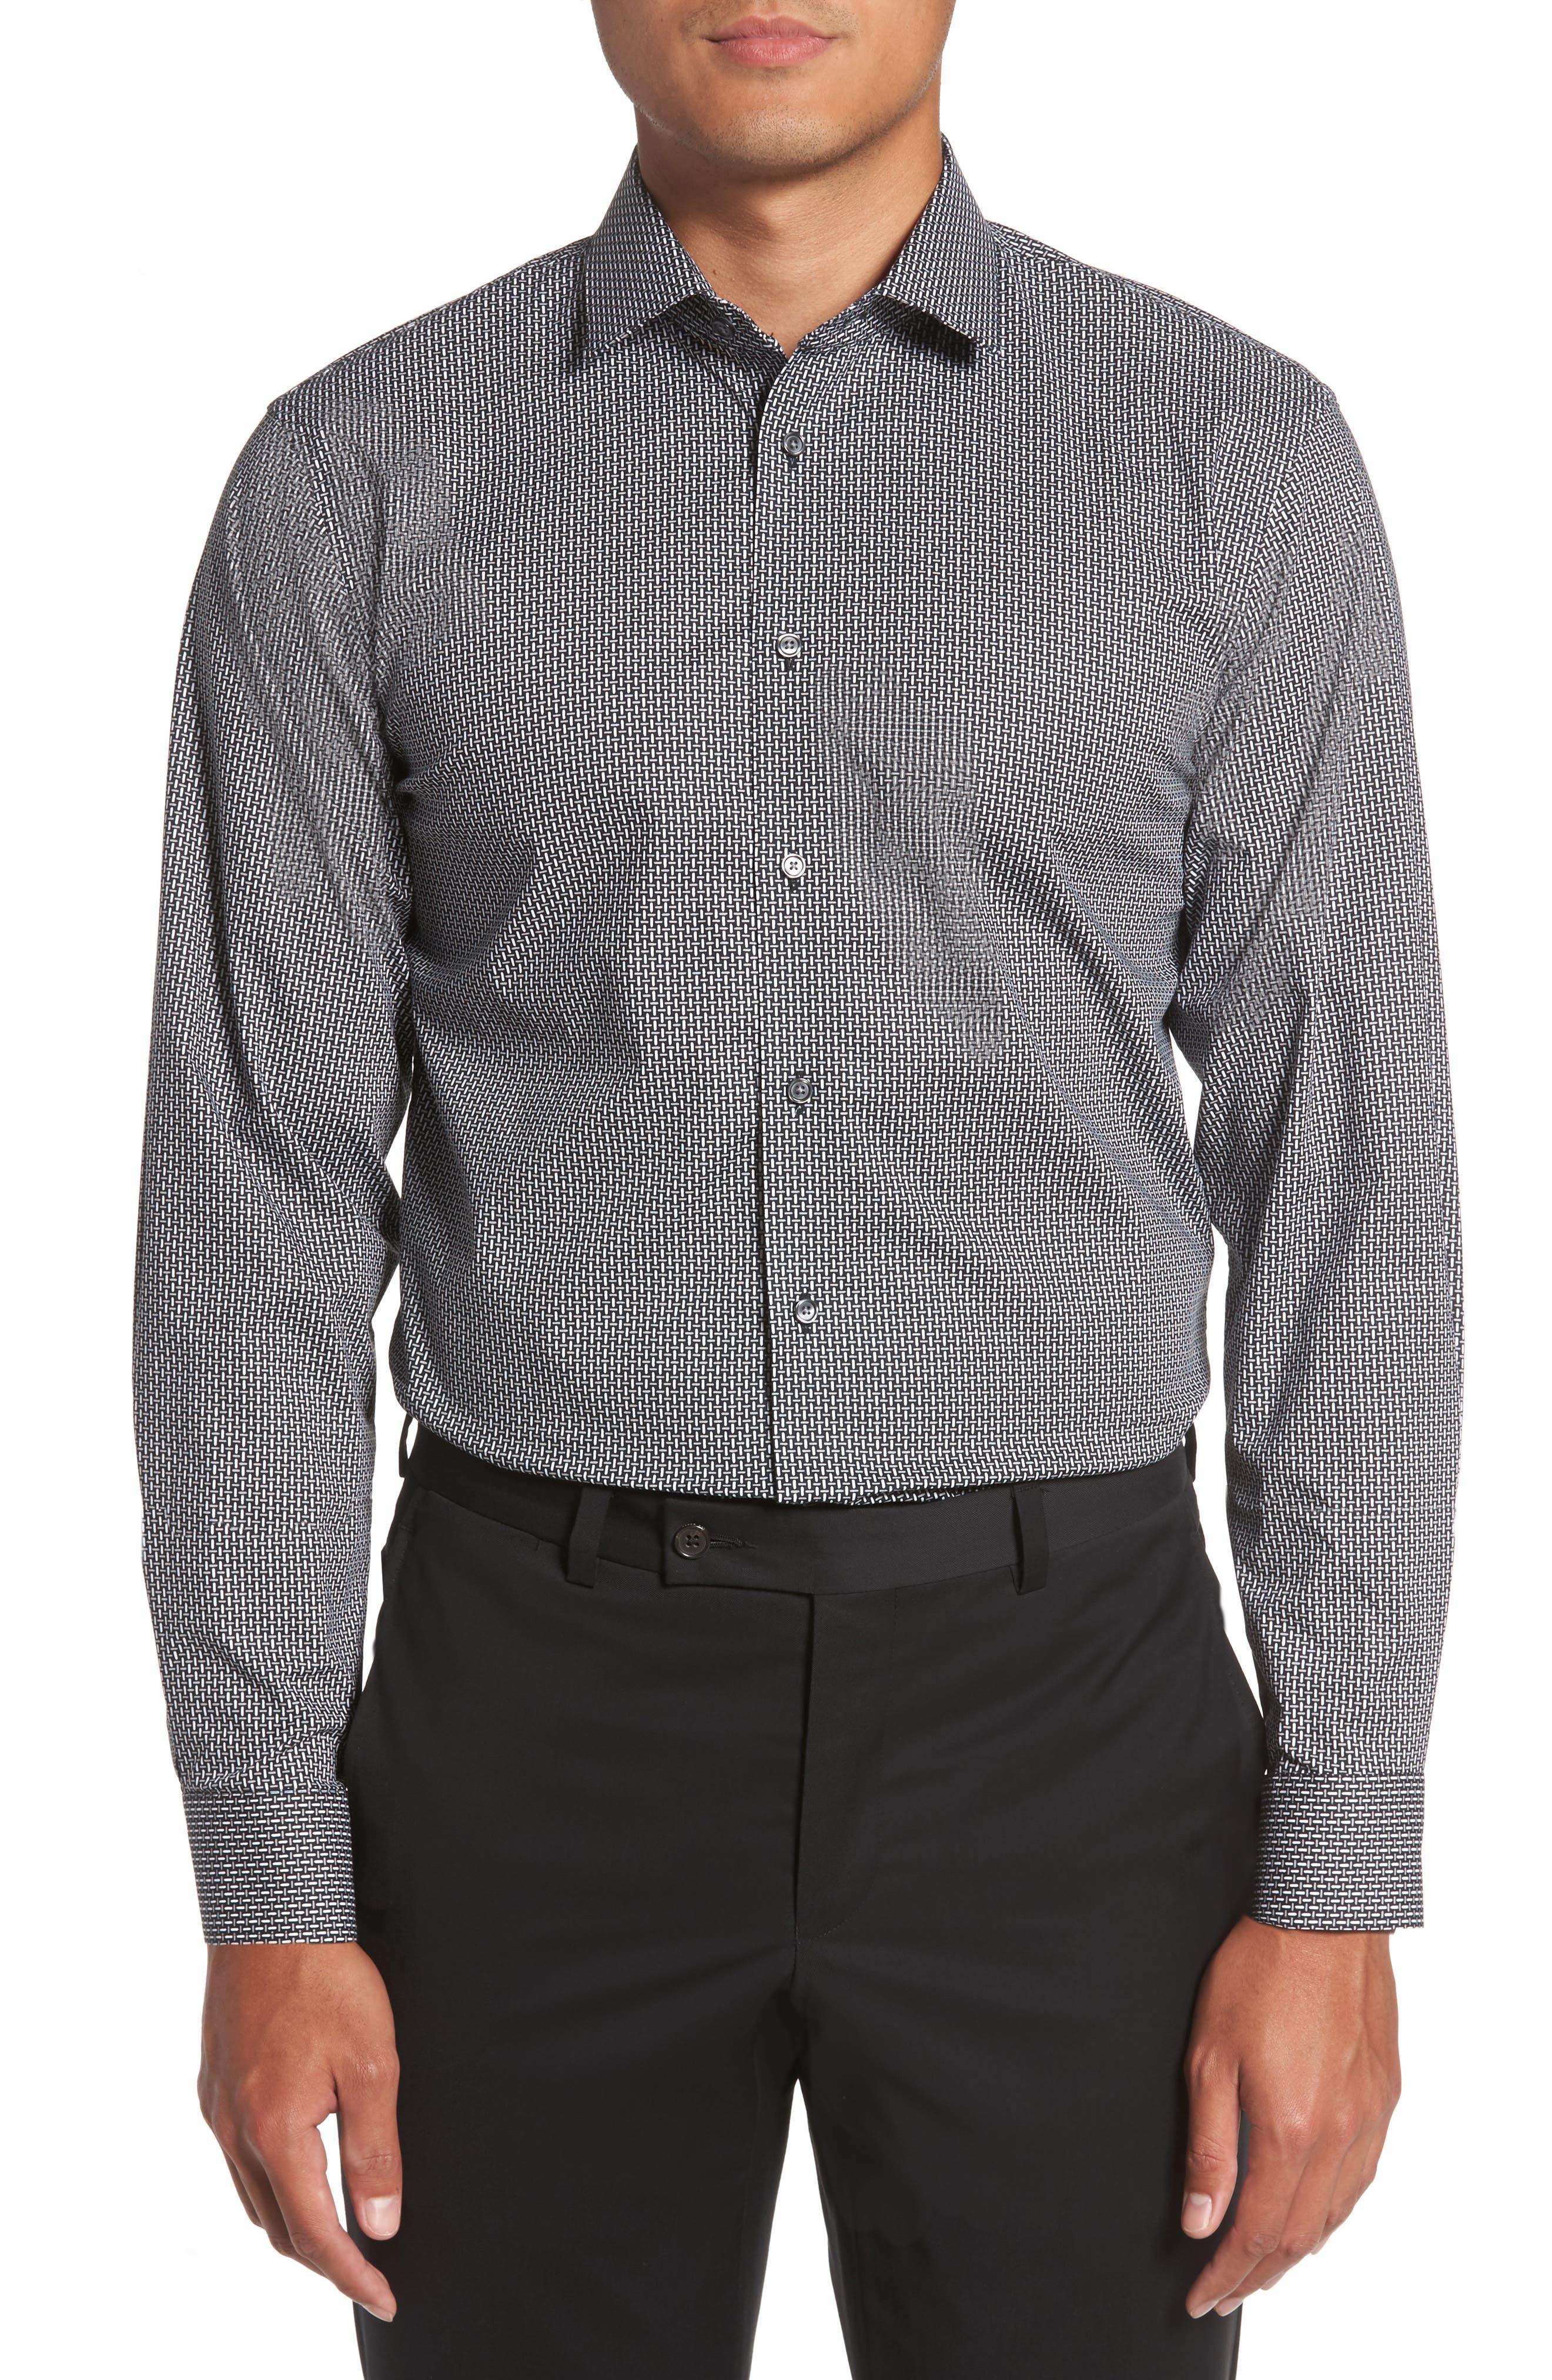 Alternate Image 2  - Calibrate Trim Fit Non-Iron Graphic Stretch Dress Shirt